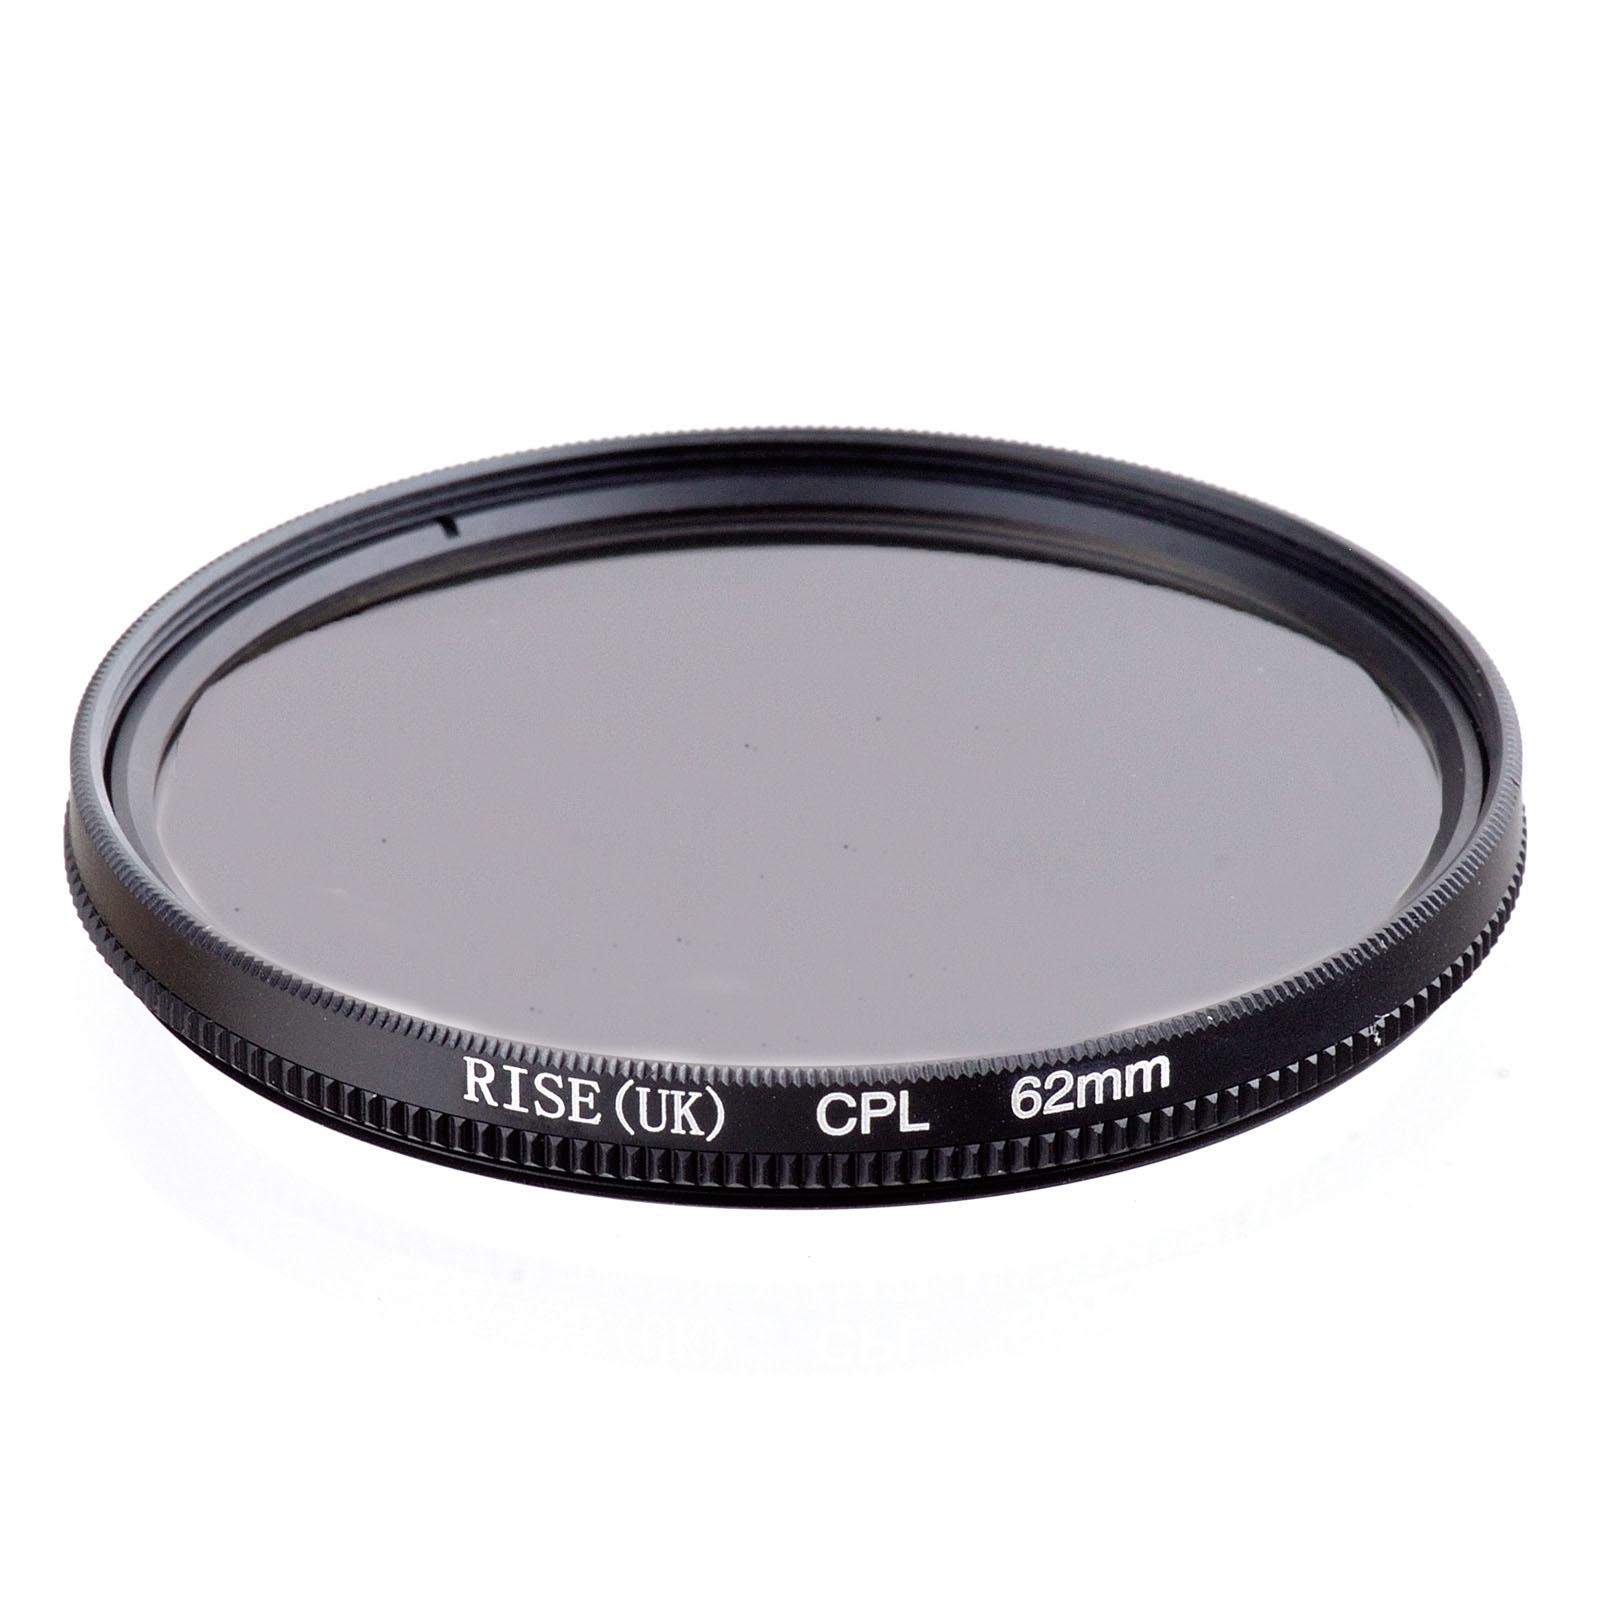 lower price RISE(UK) 62mm Circular Polarizing CPL C-PL Filter Lens 62mm For Canon NIKON Sony Olympus Camera(China (Mainland))